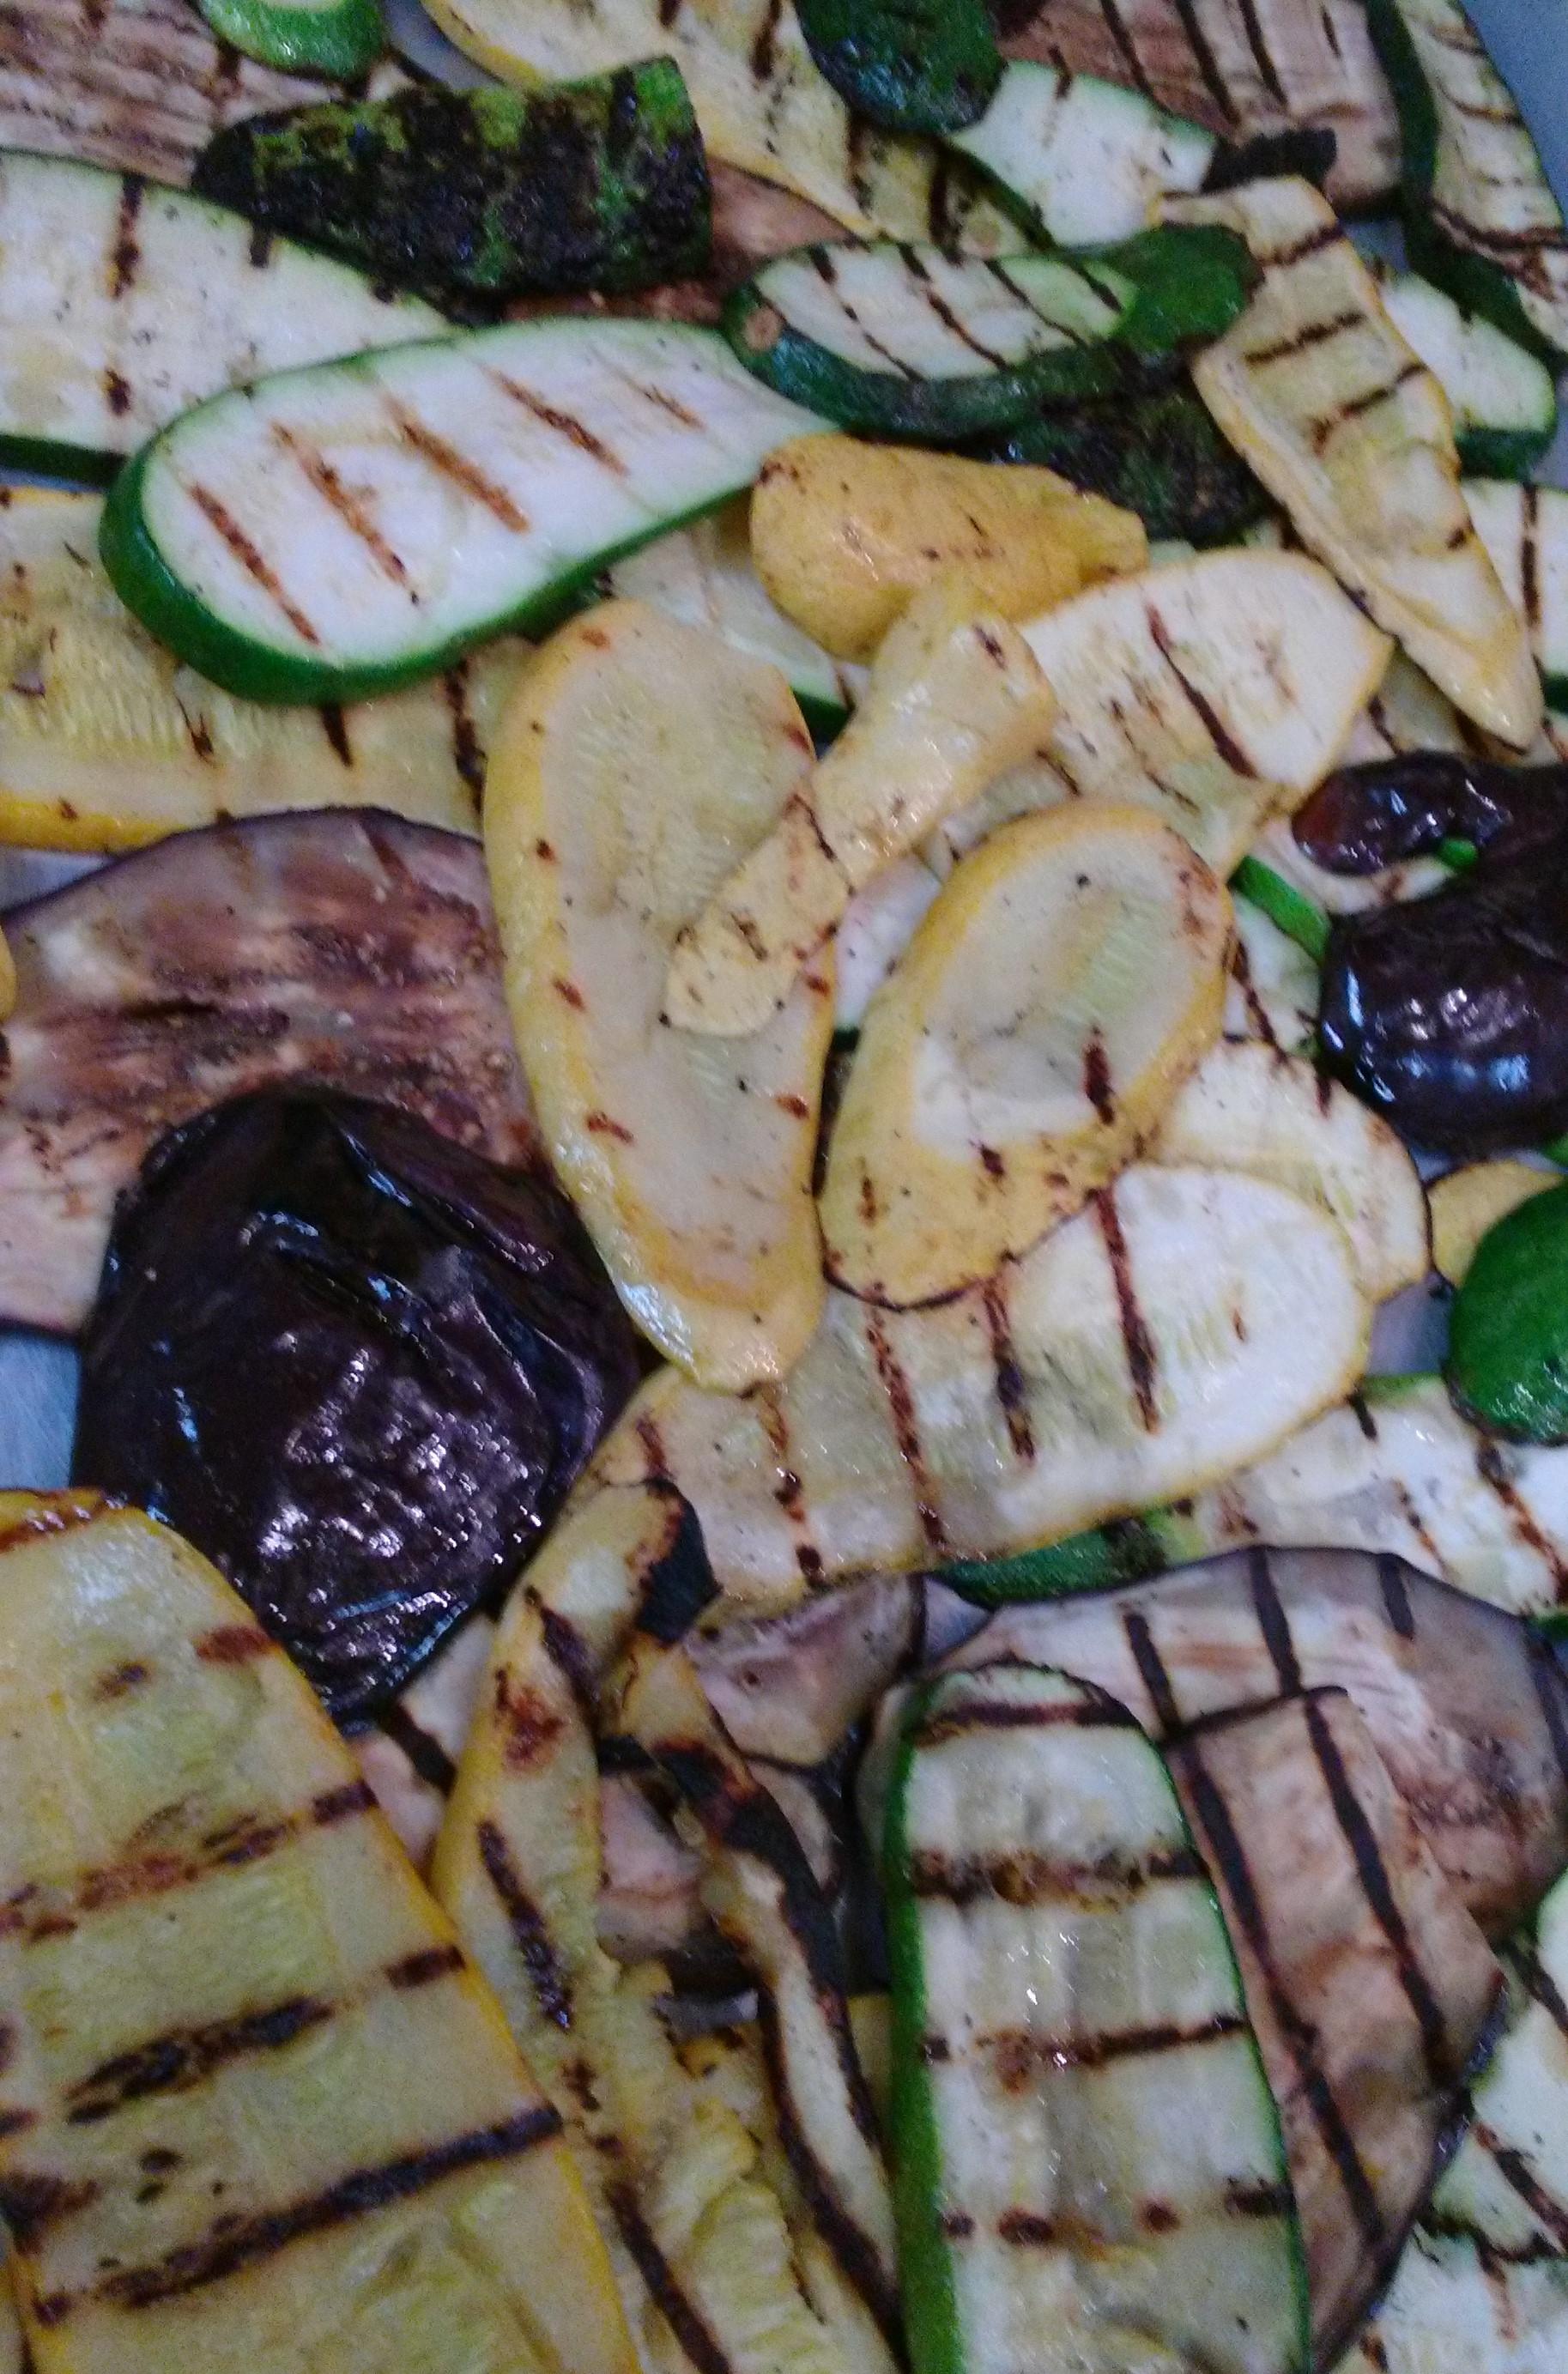 Grilled Fresh Veggies